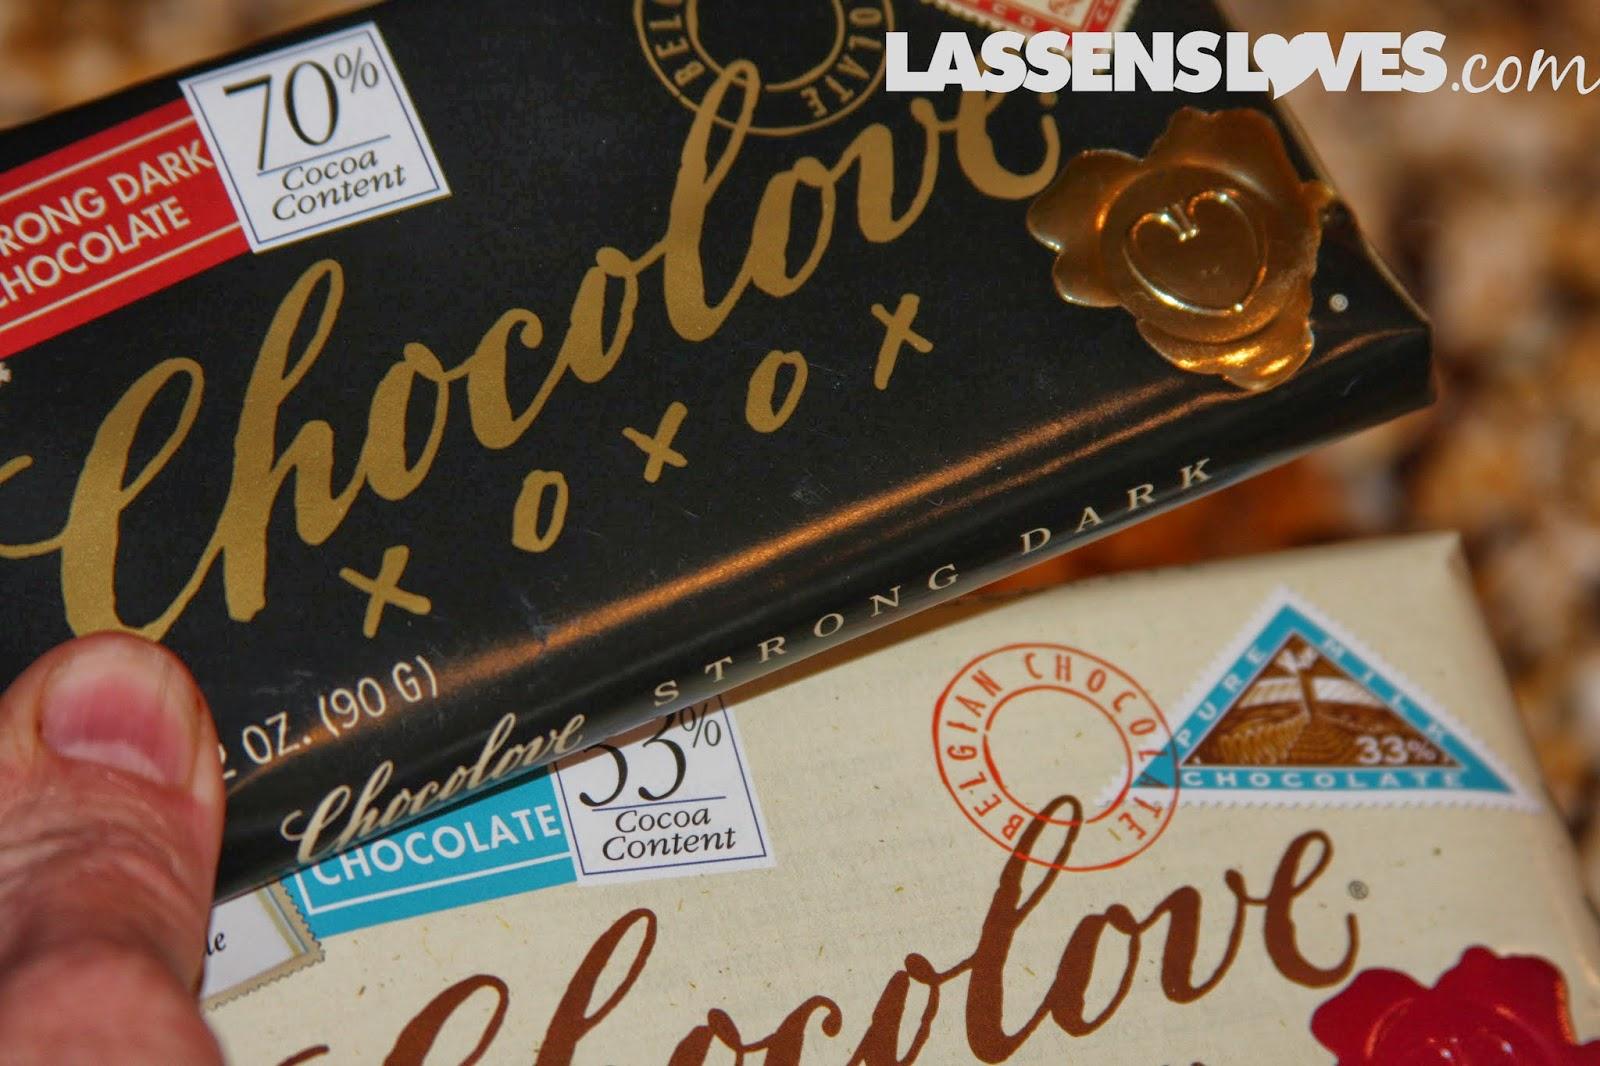 chocolove+chocolate